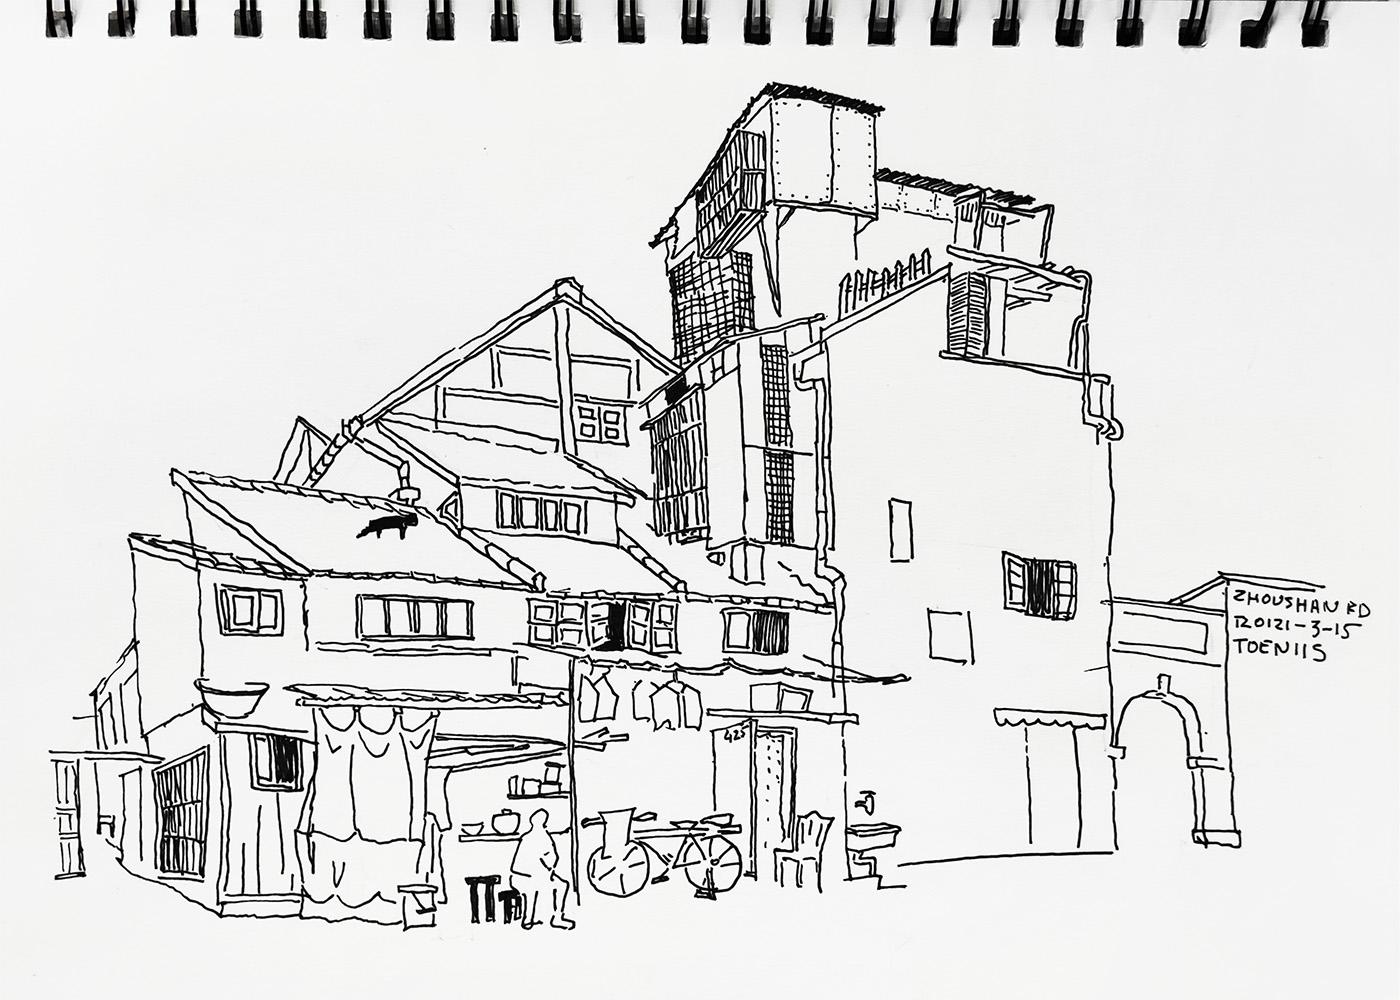 Artist: Toeniis. 425 Zhoushan Road